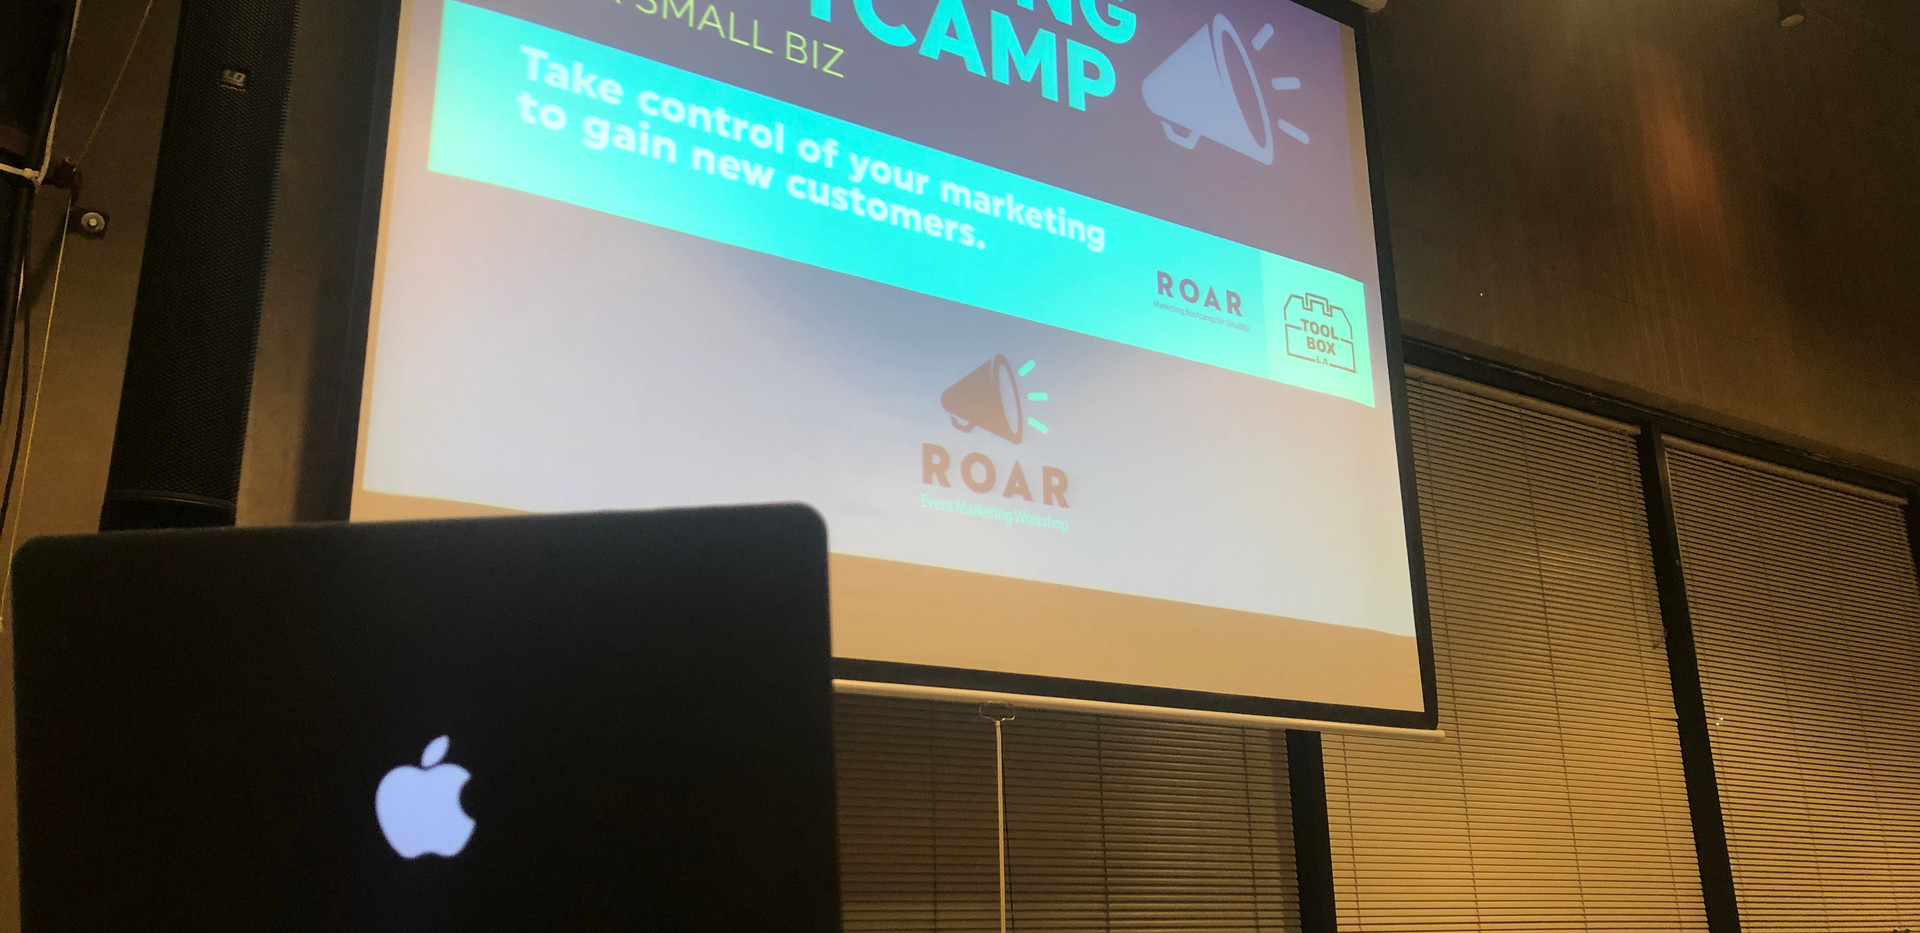 marketingbootcamp 33.JPG